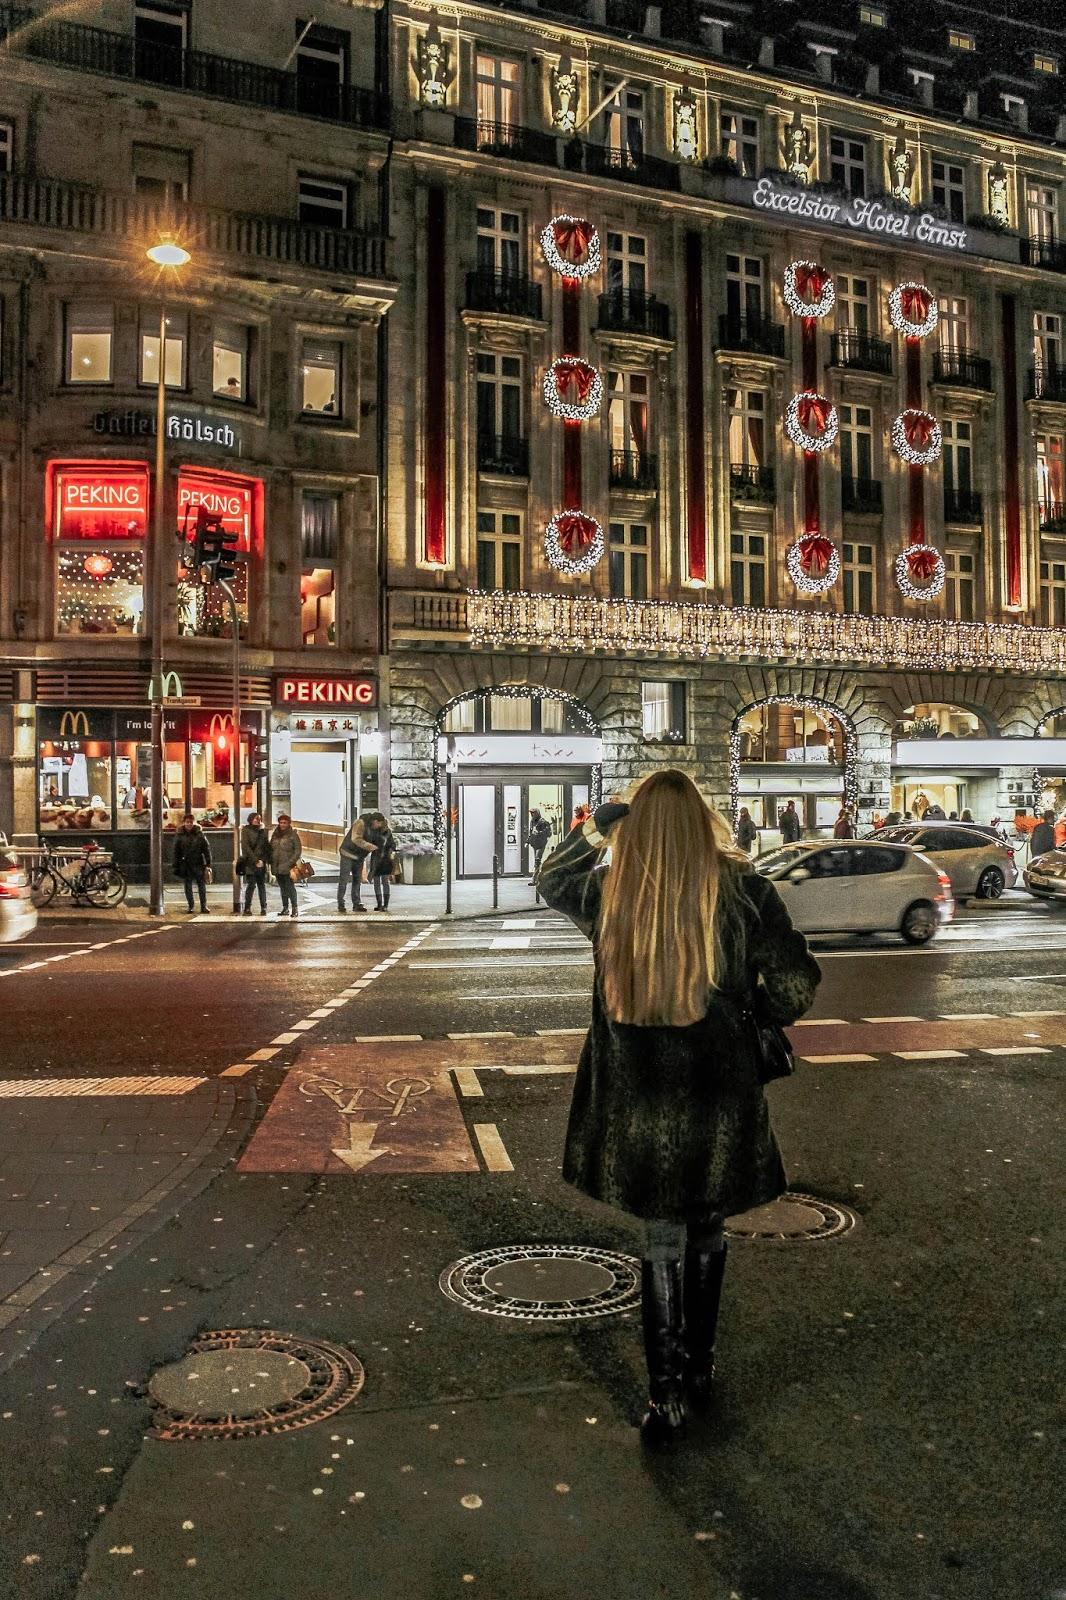 Luxury Hotel Excelsior Ernst By Night